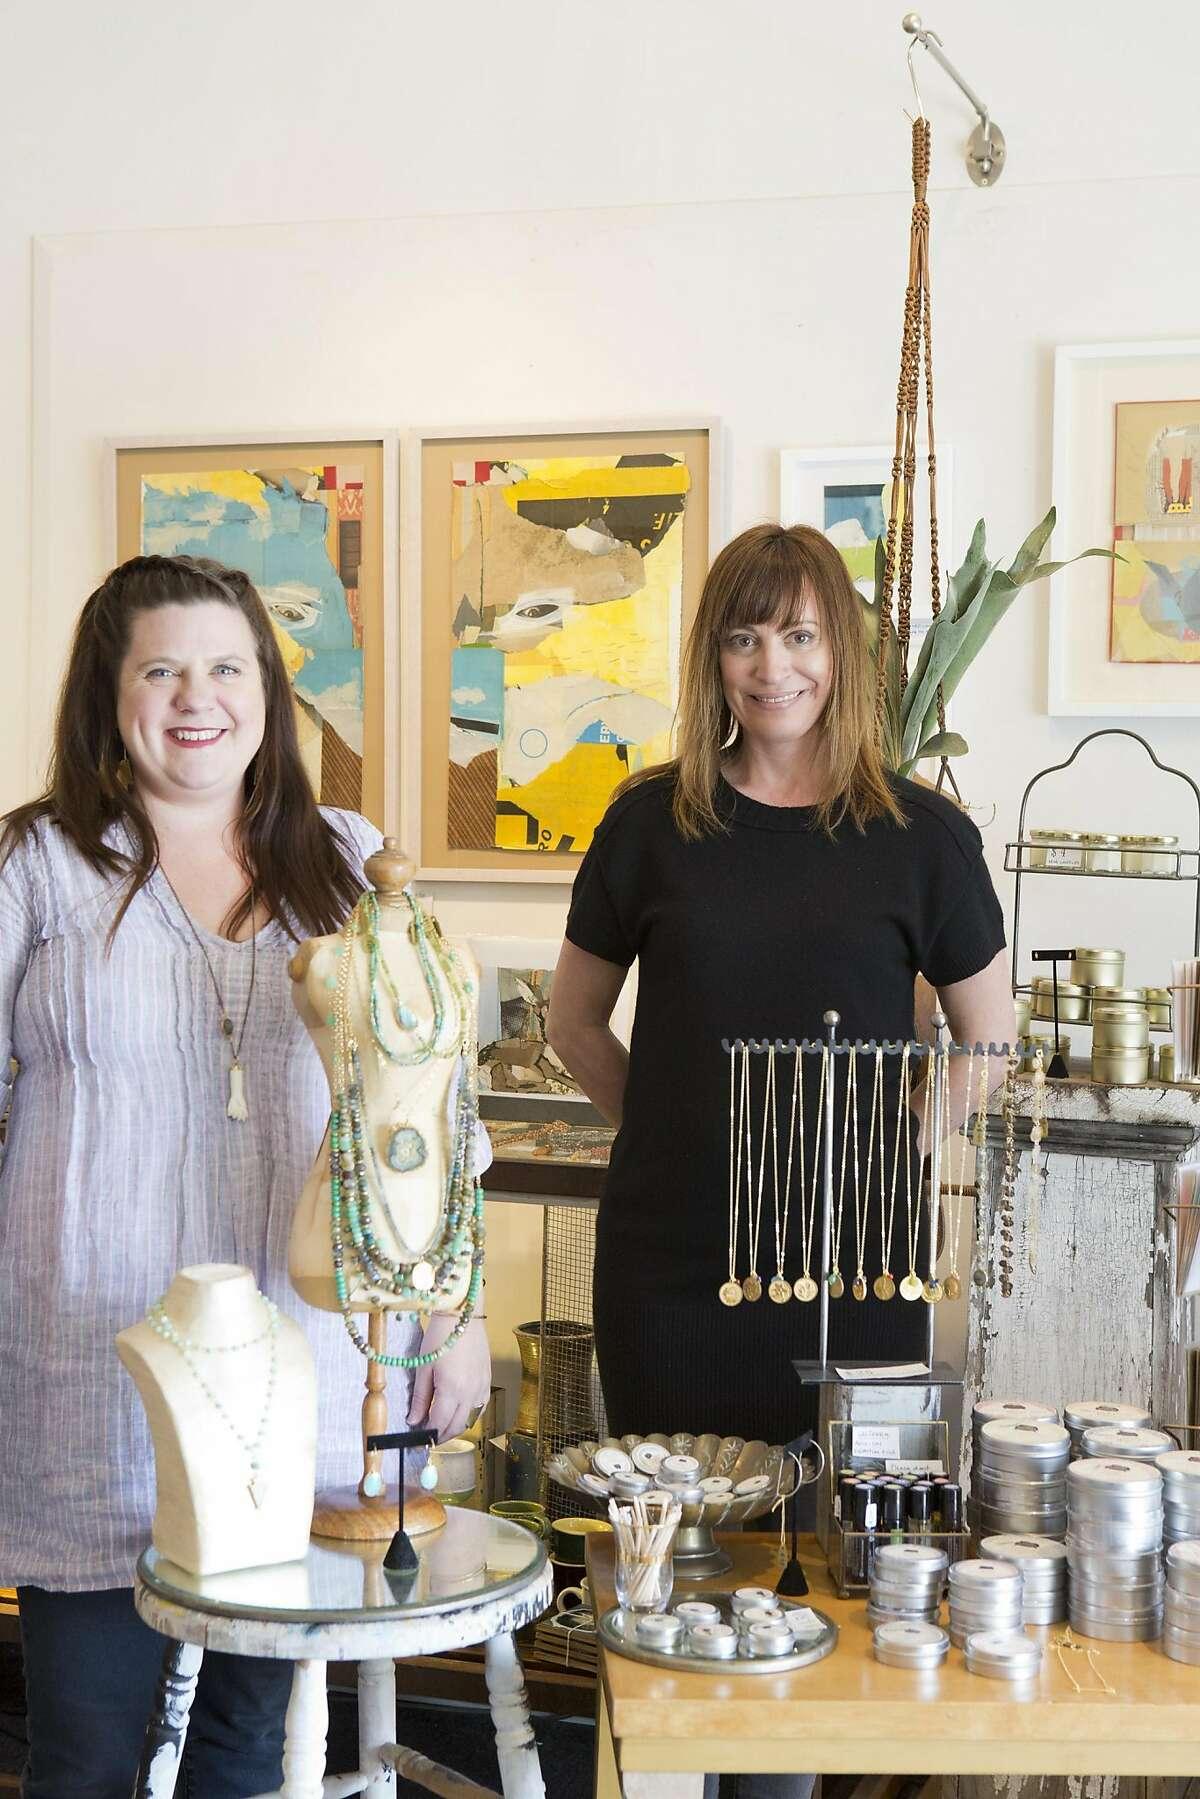 Jam Jar sells art and trendy handmade jewelry, run by Molly & Jaime Jean